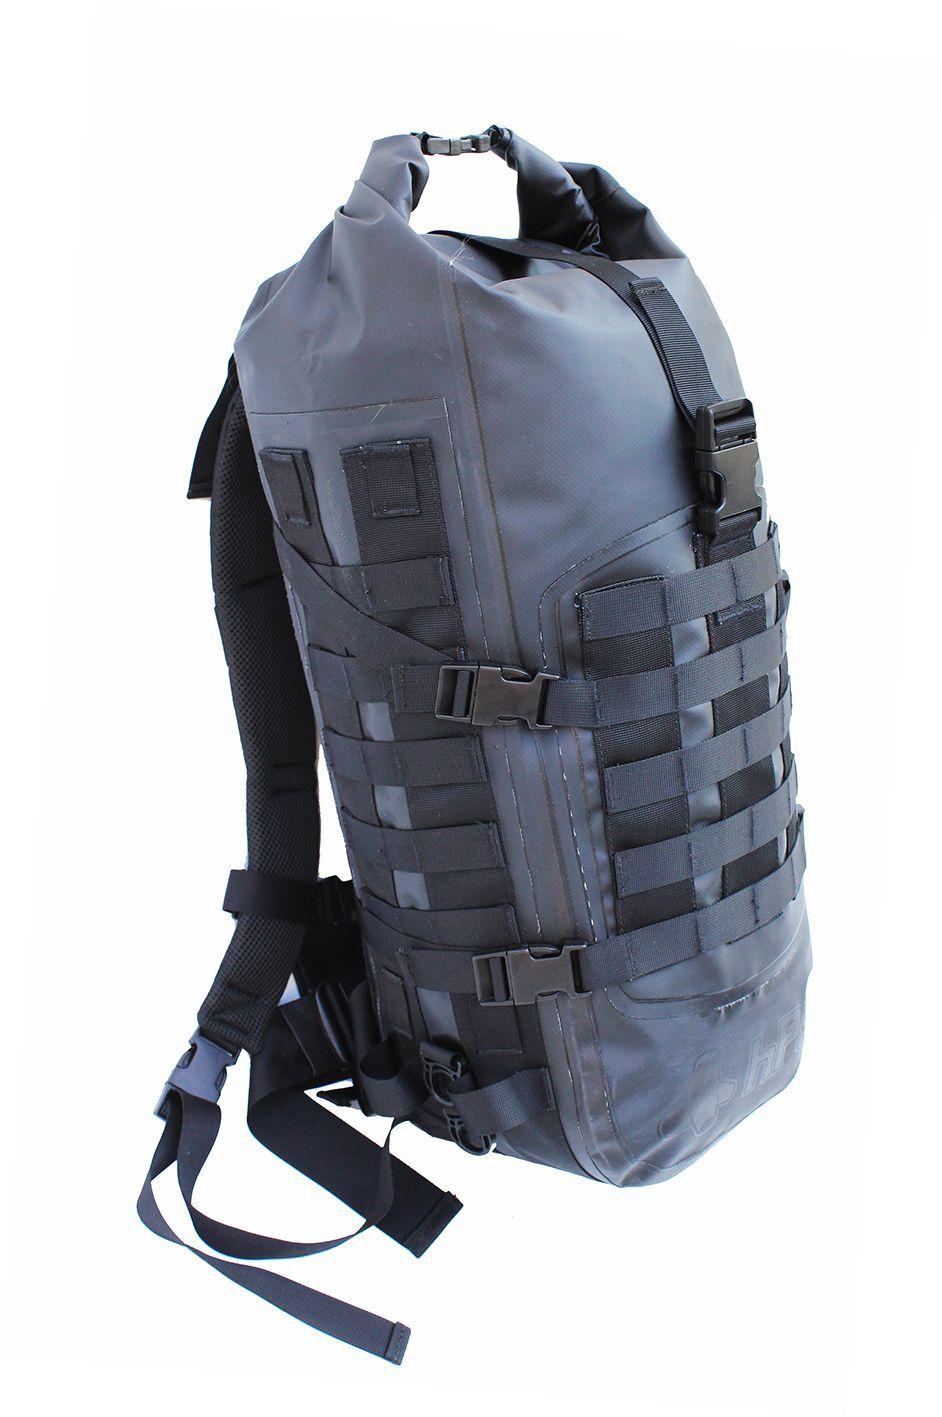 M.O.L.L.E waterproof backpack … | Pinteres…